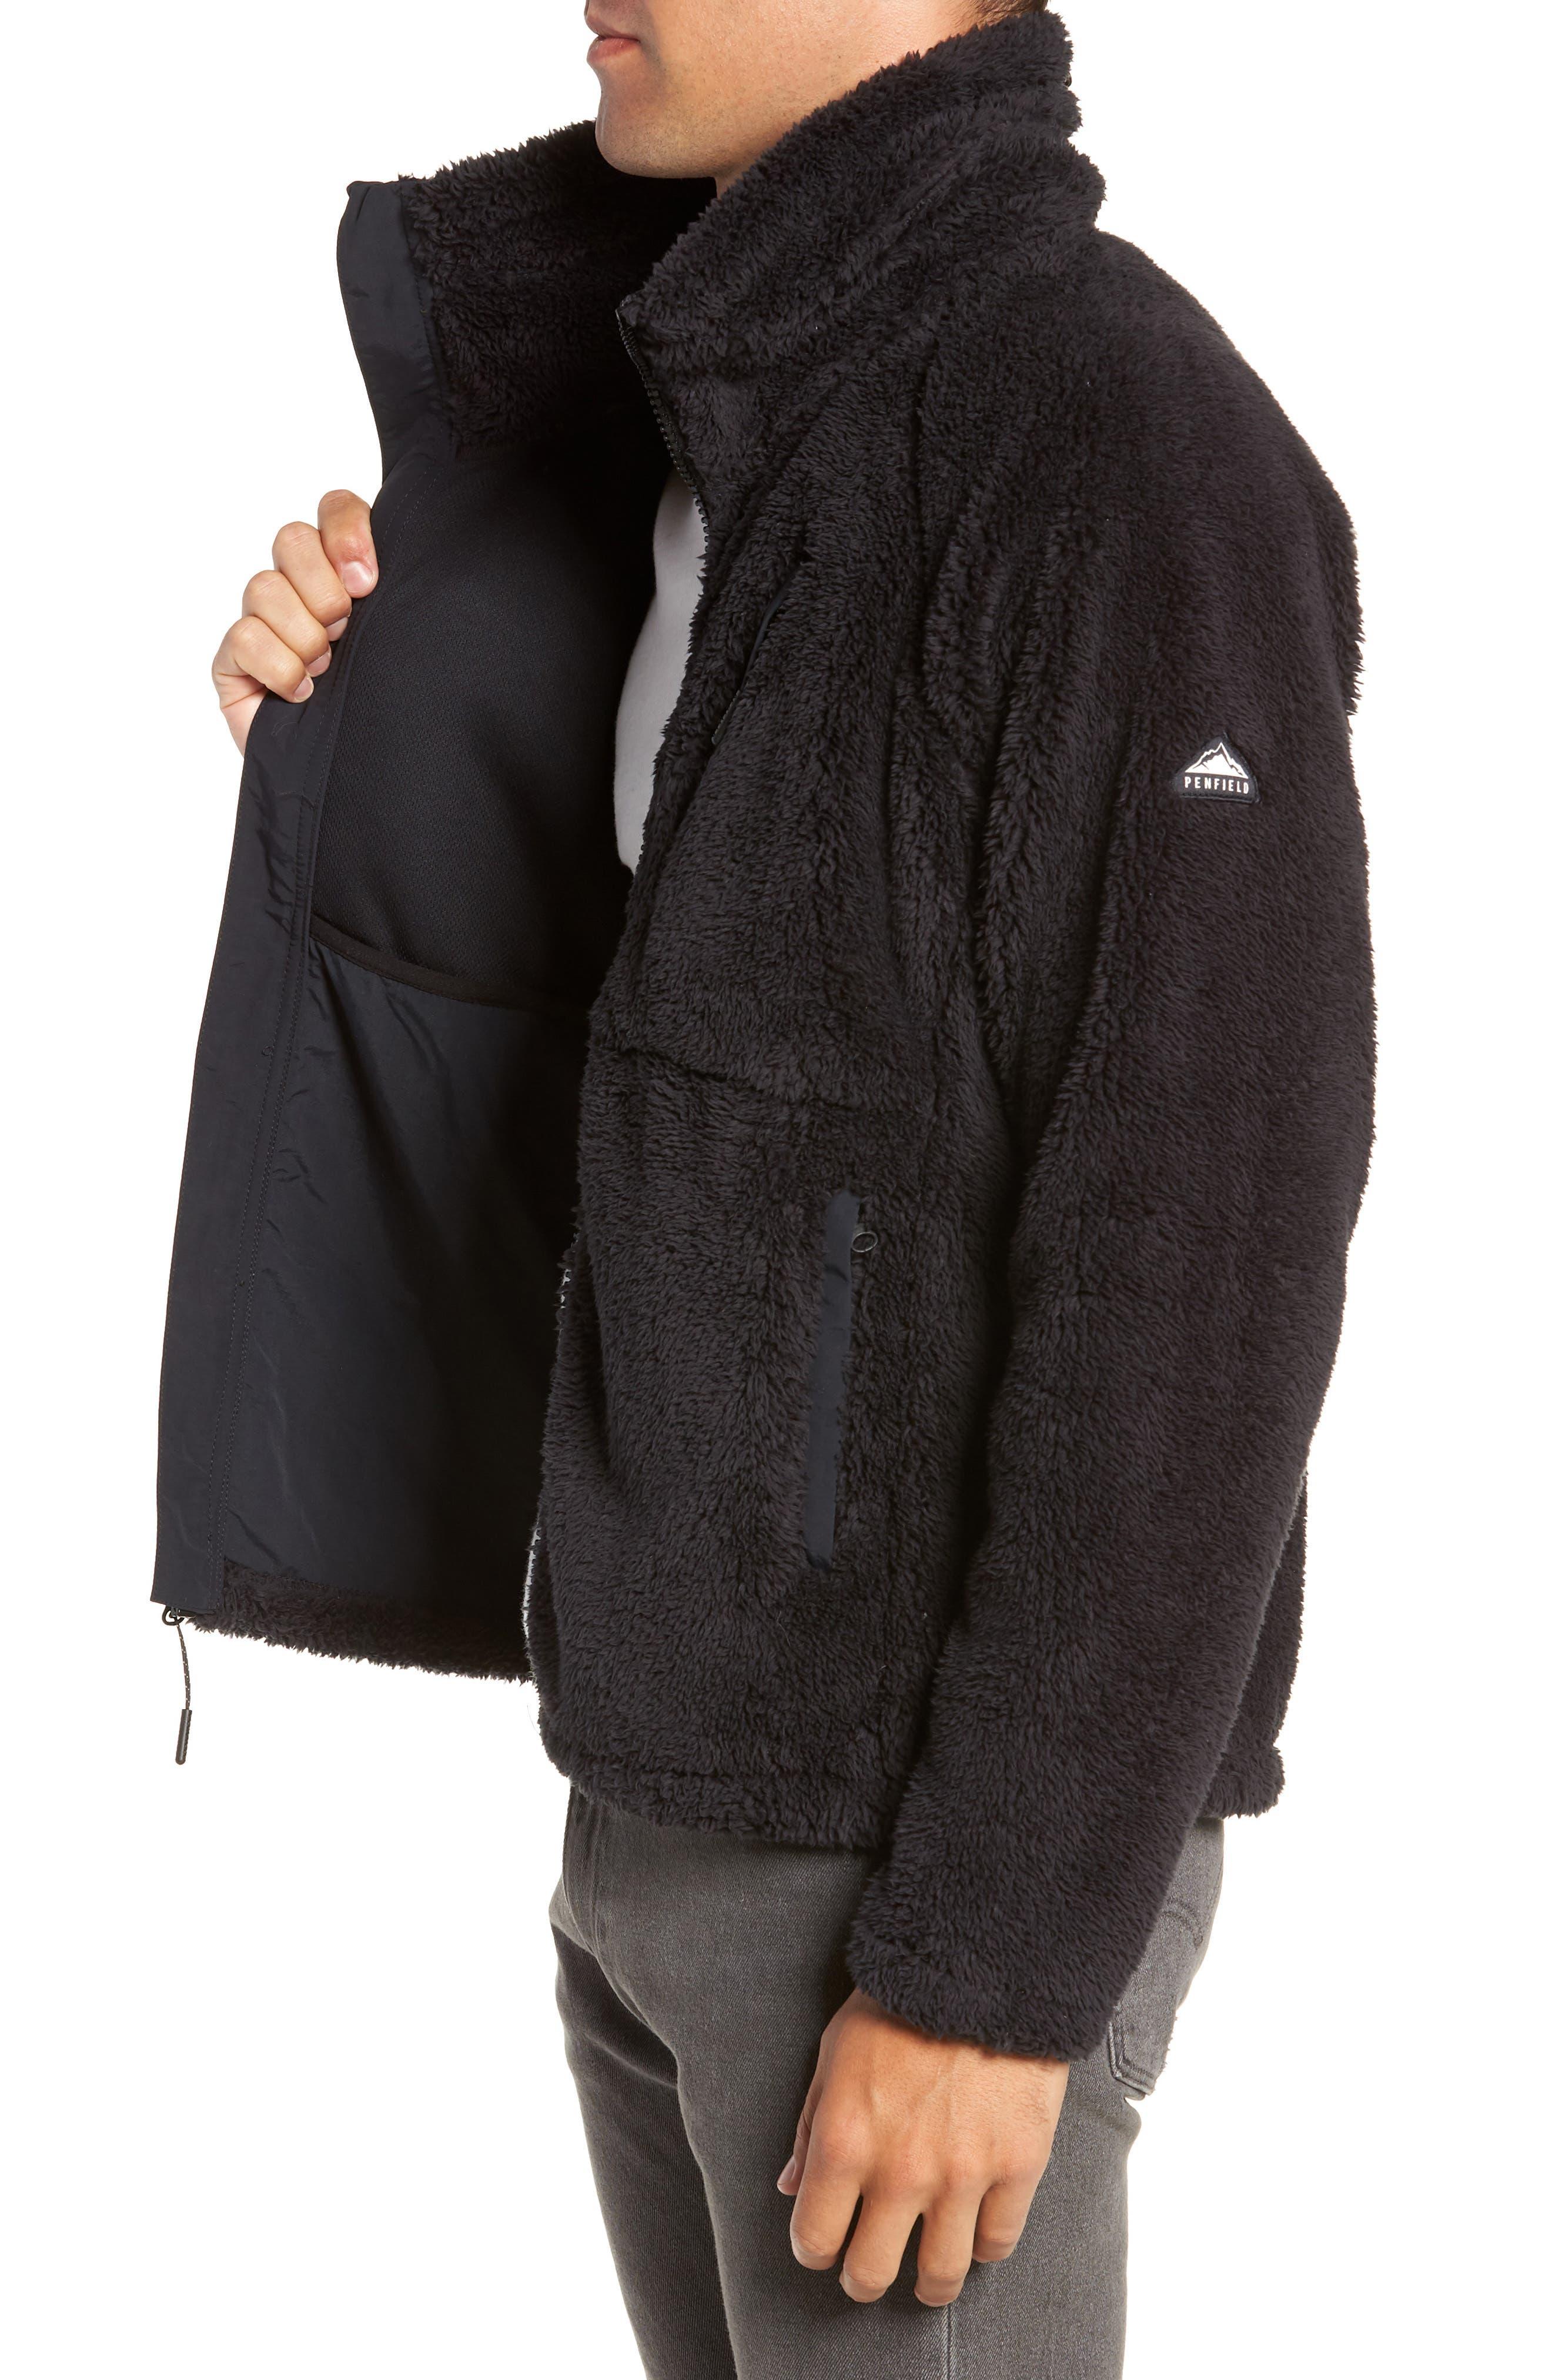 Breakheart Zip Fleece Jacket,                             Alternate thumbnail 3, color,                             001